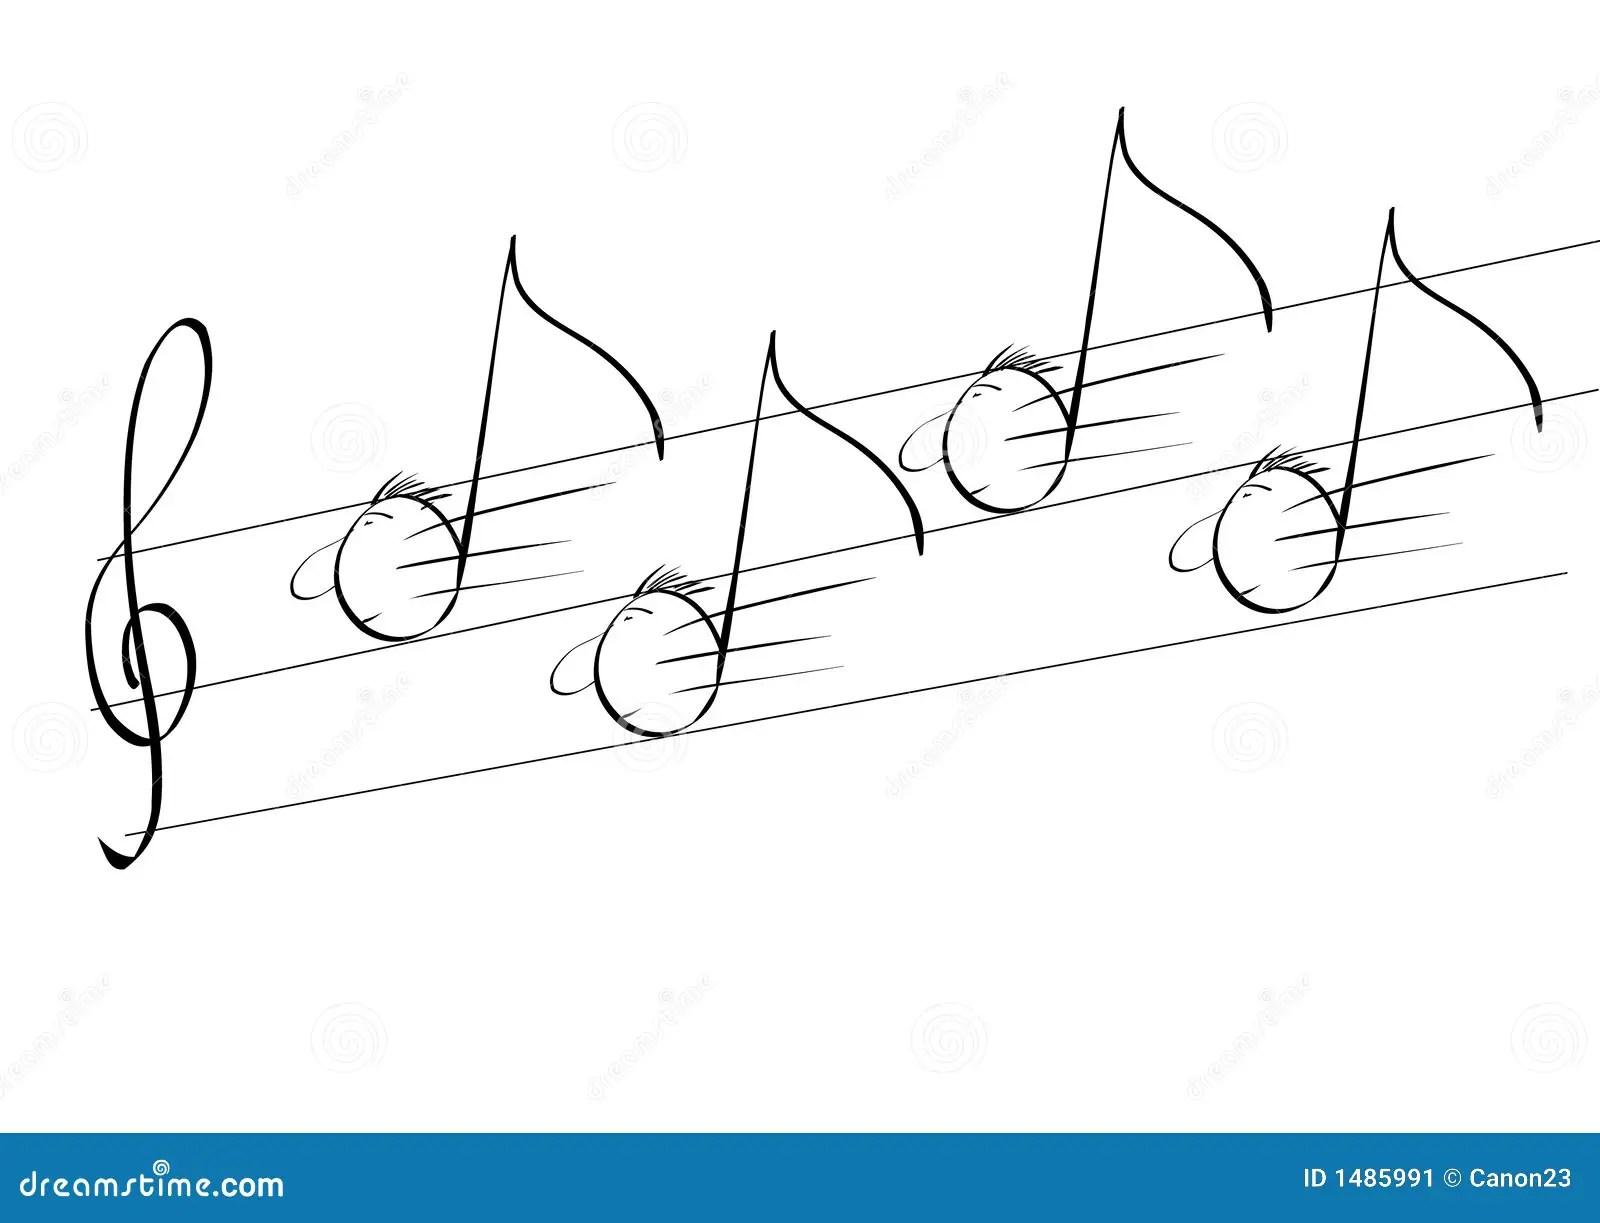 Running music stock vector. Image of sheet, sound